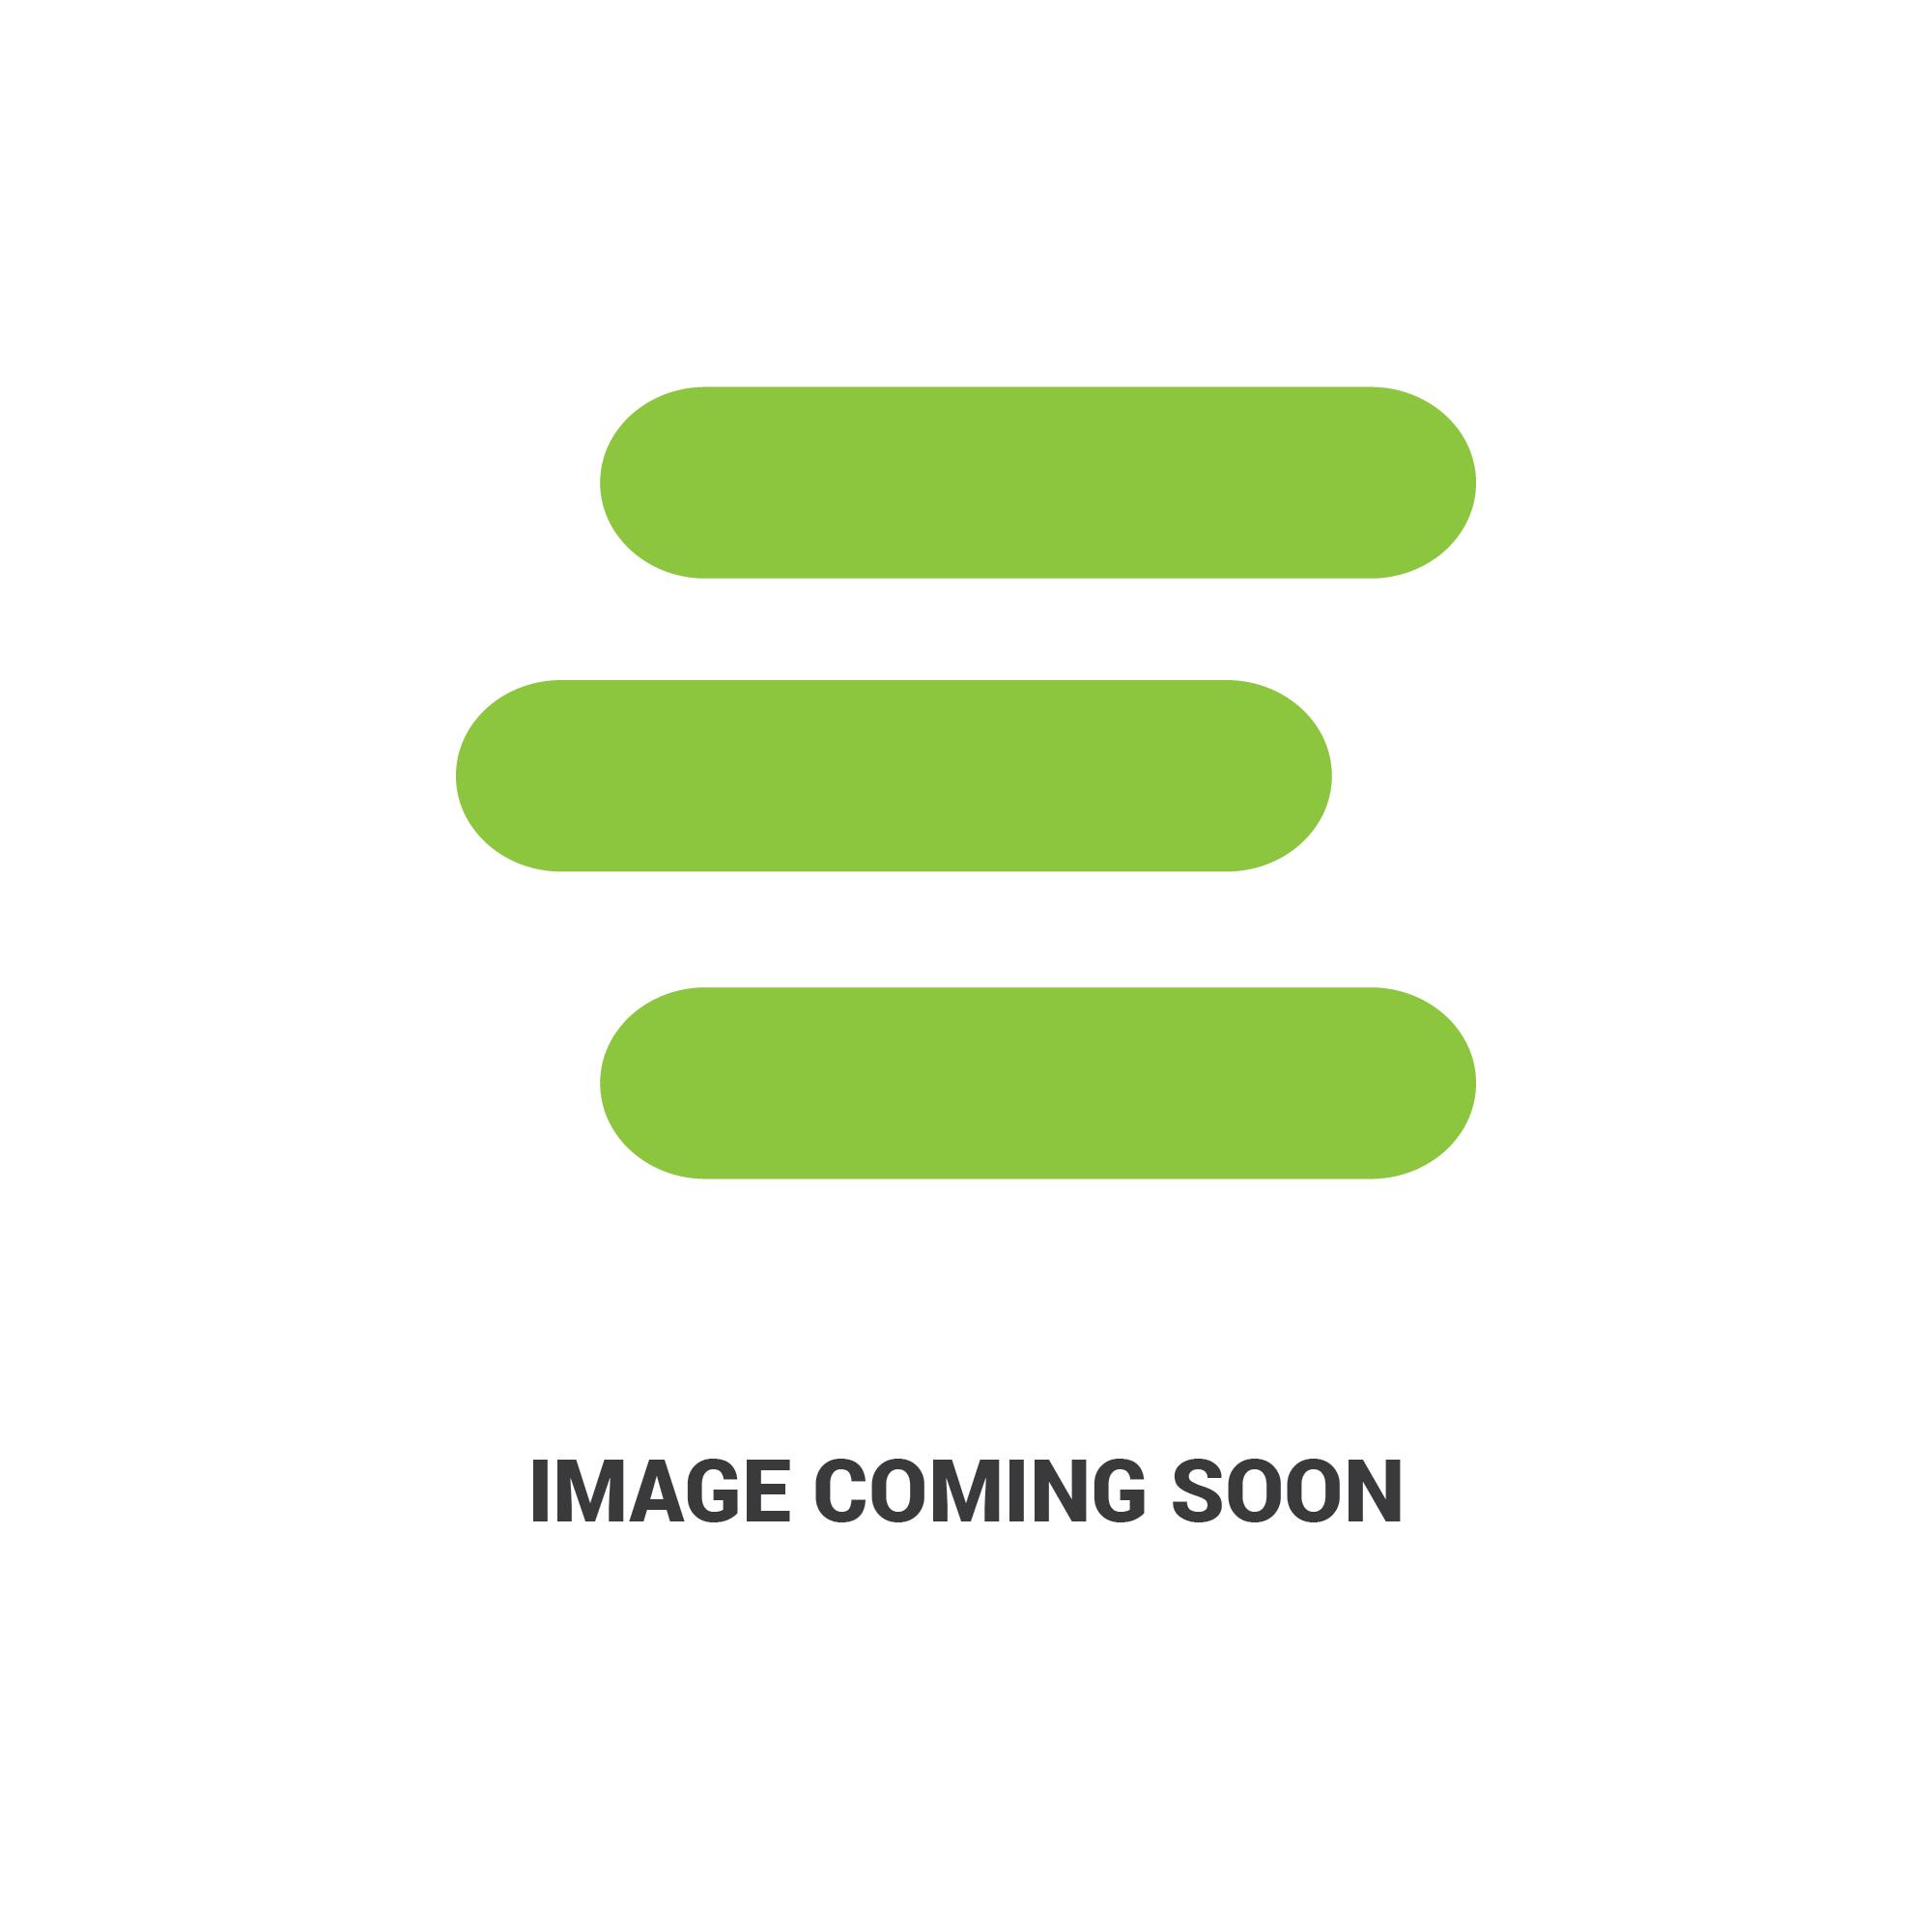 E-16264-74110edit 1.jpg